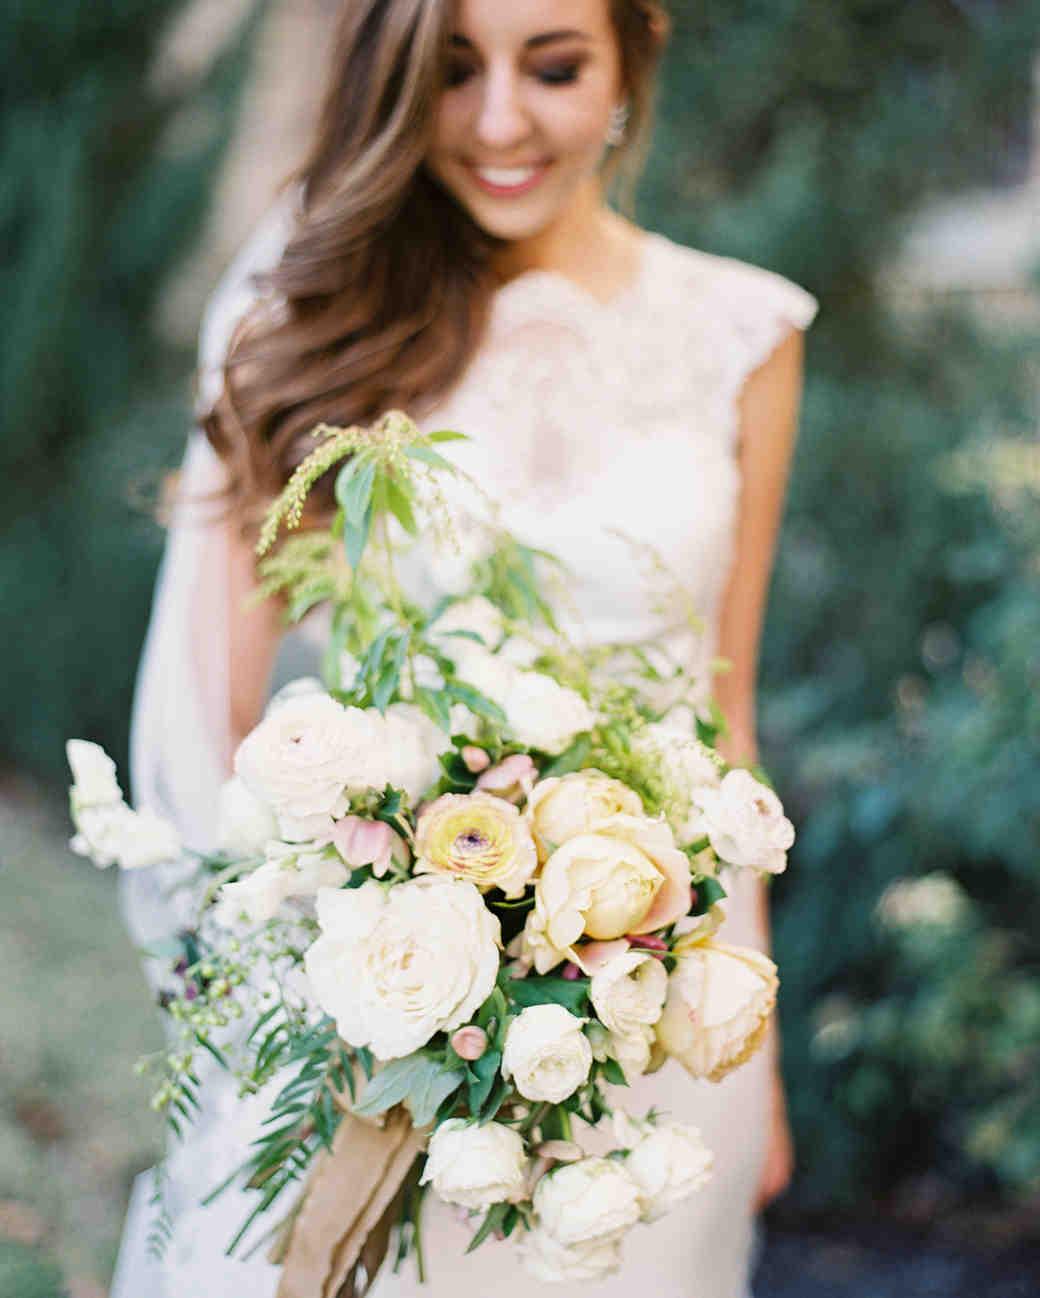 afton travers wedding bouquet